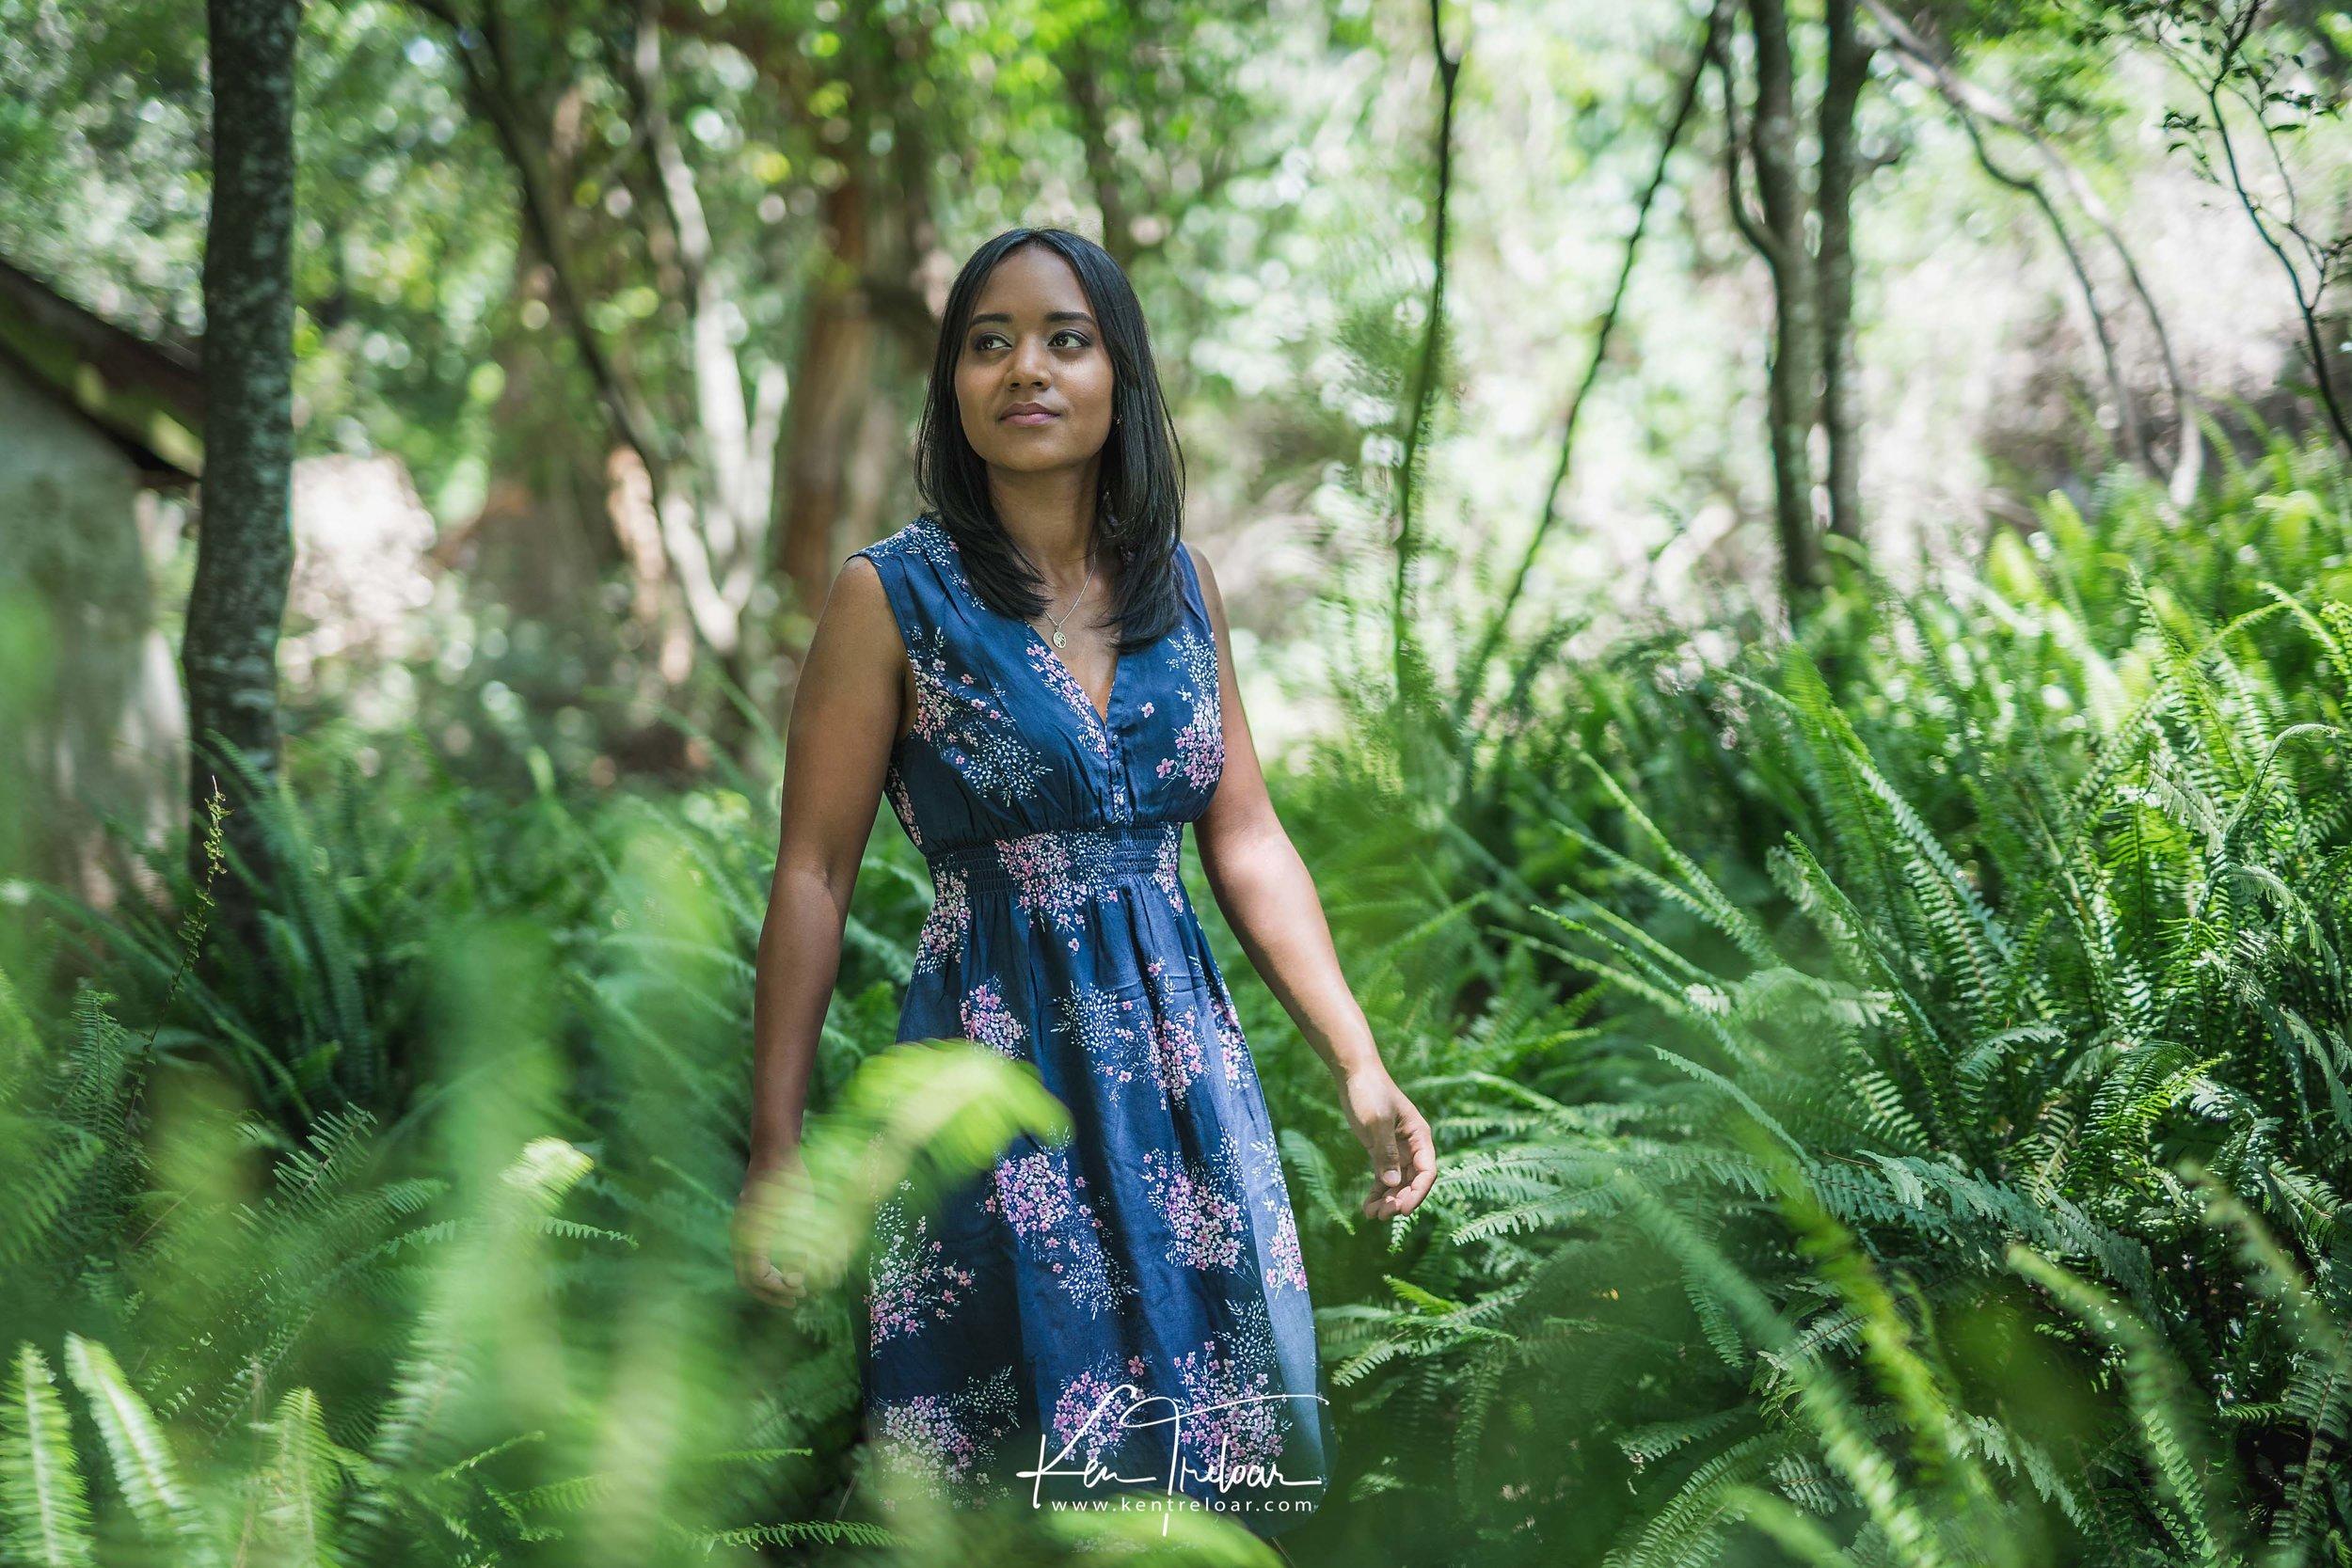 Ken Treloar Photography - Natural Light Editorial Portrait Fashion Photo Session - Cape Town Dec 2018-6.jpg